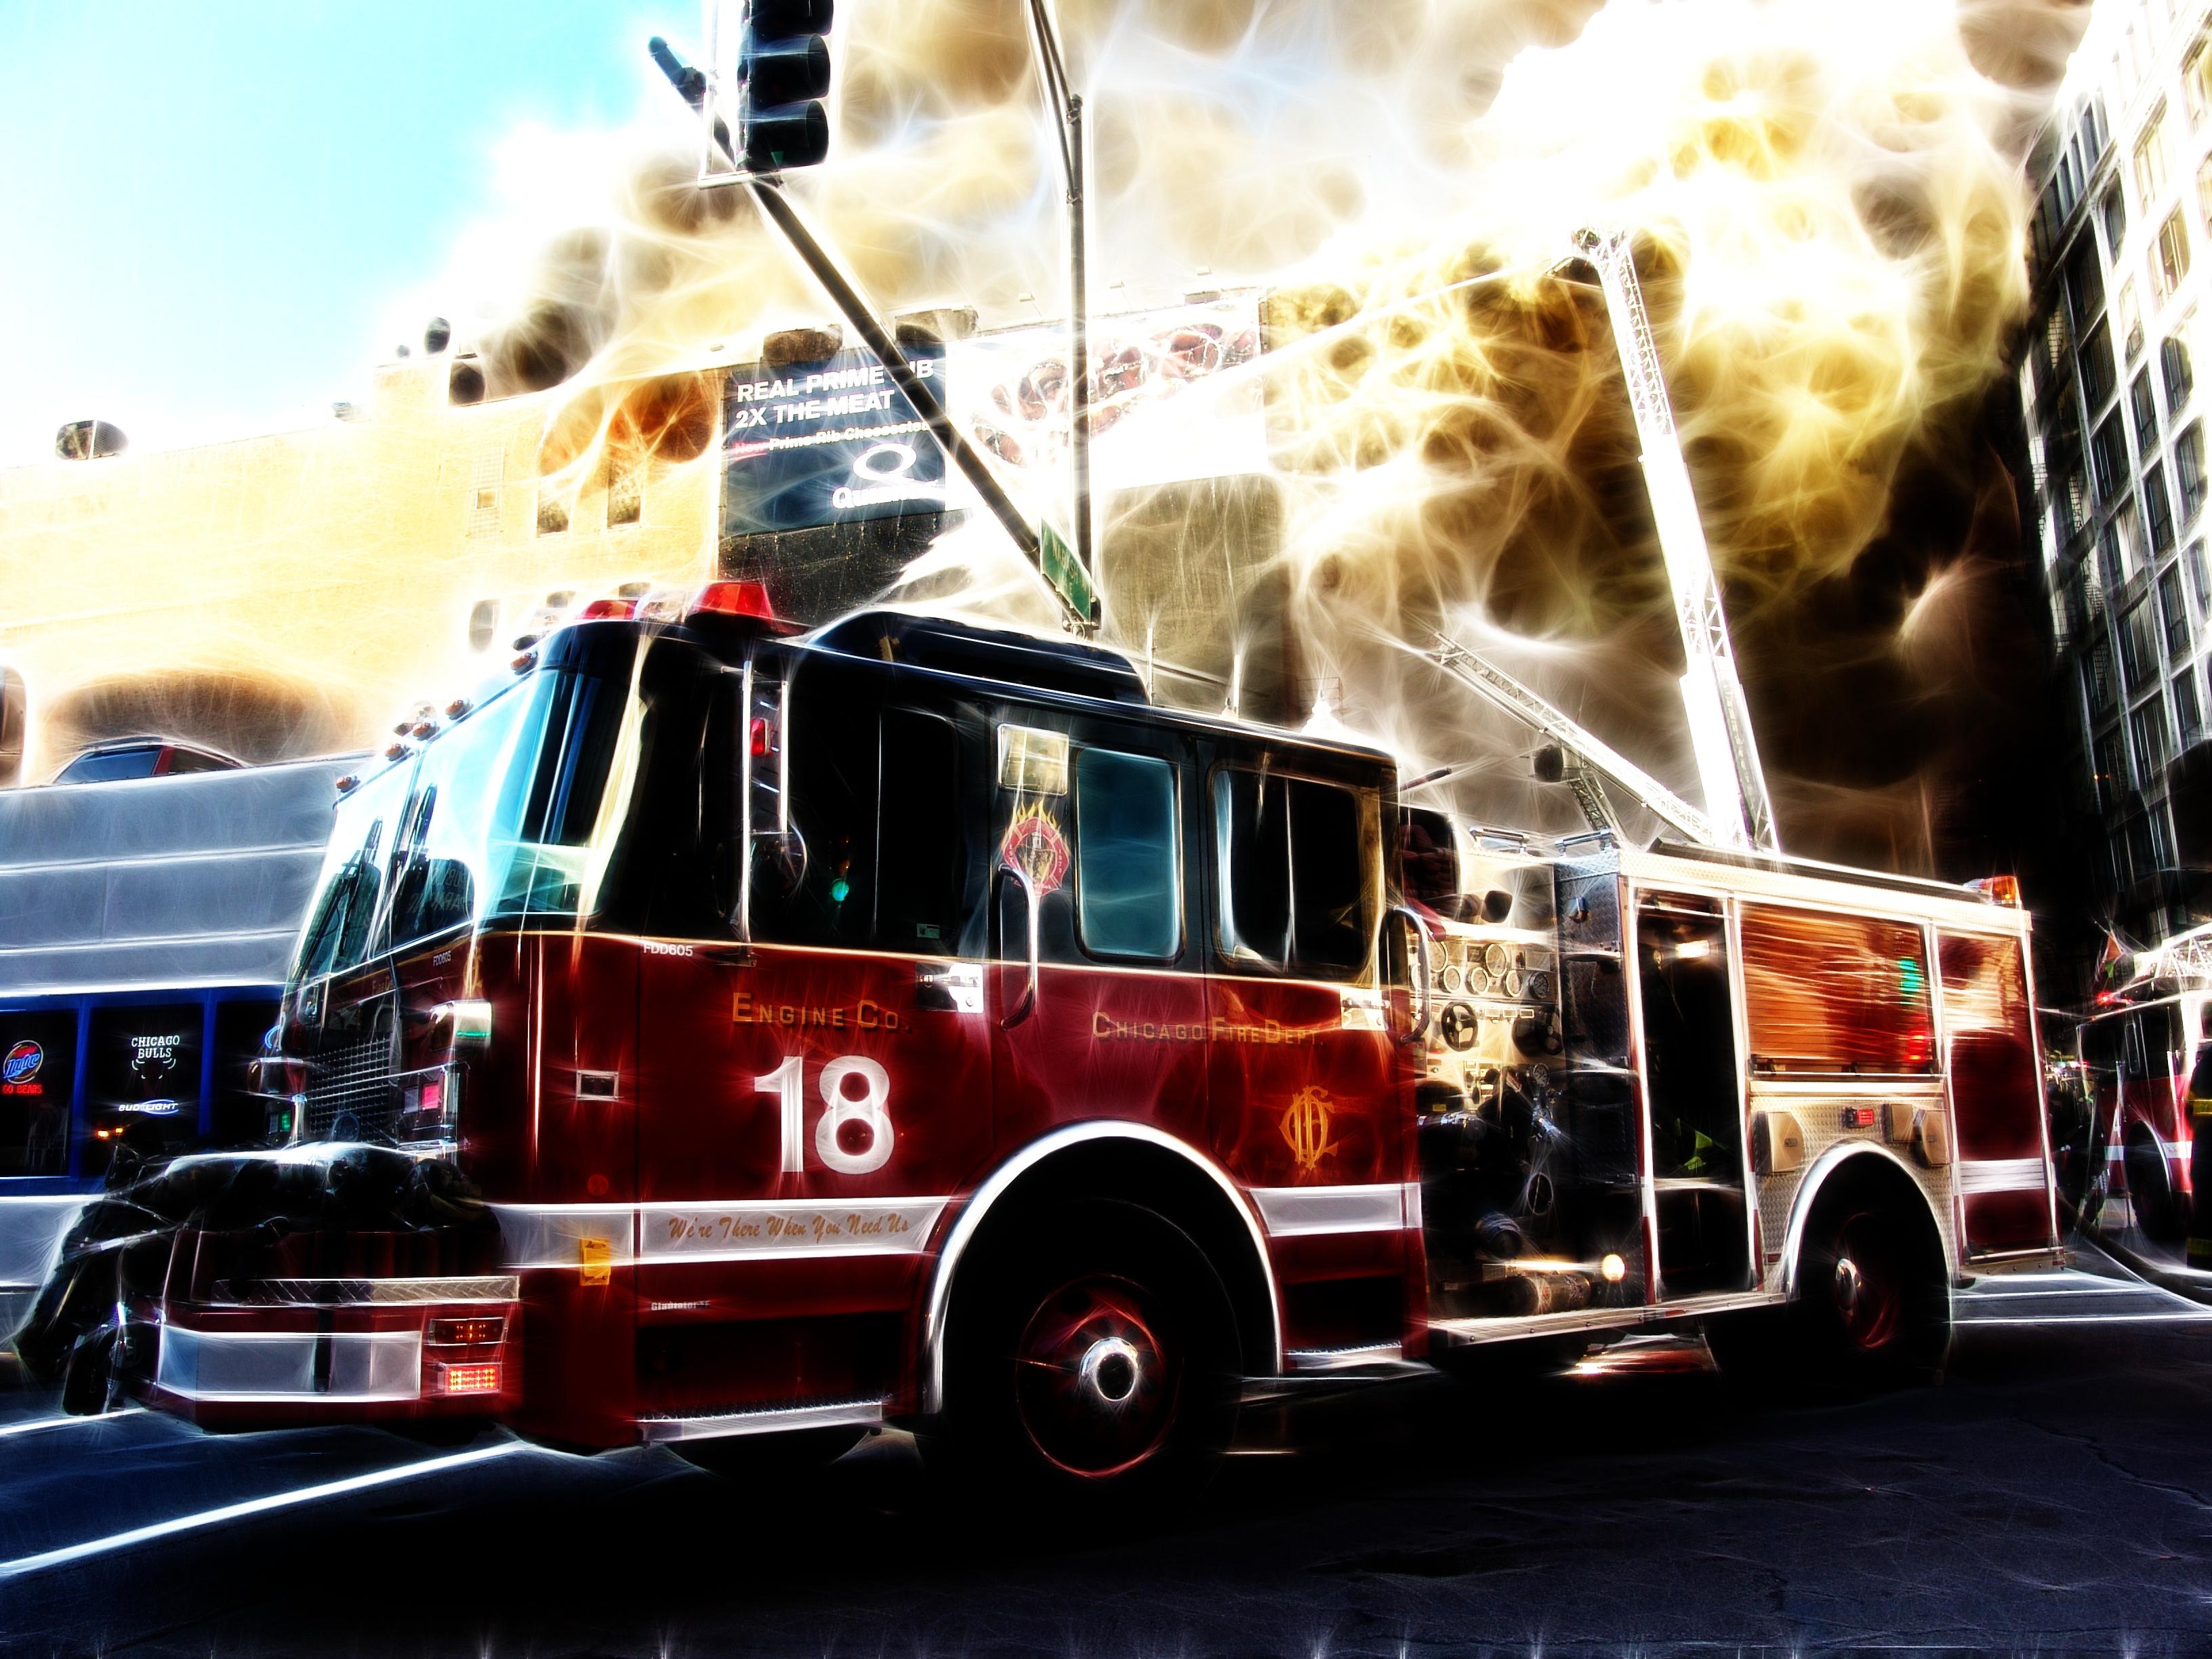 47 Fire Truck Wallpaper Desktop On Wallpapersafari